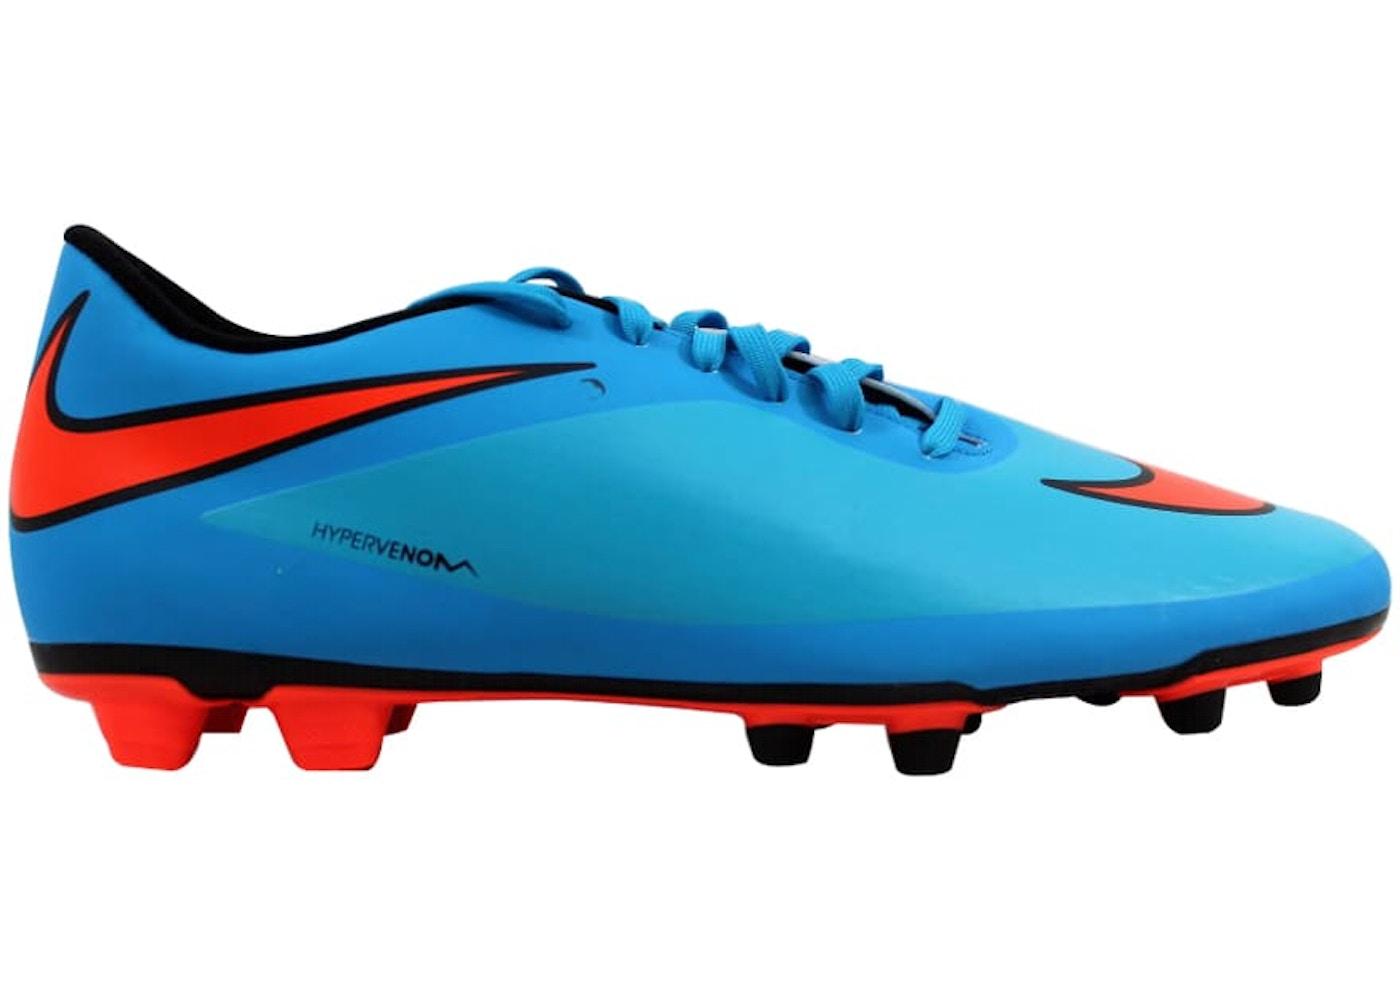 meet 2afb3 f2caa Nike Hypervenom Phade FG Clearwater - 599809-484